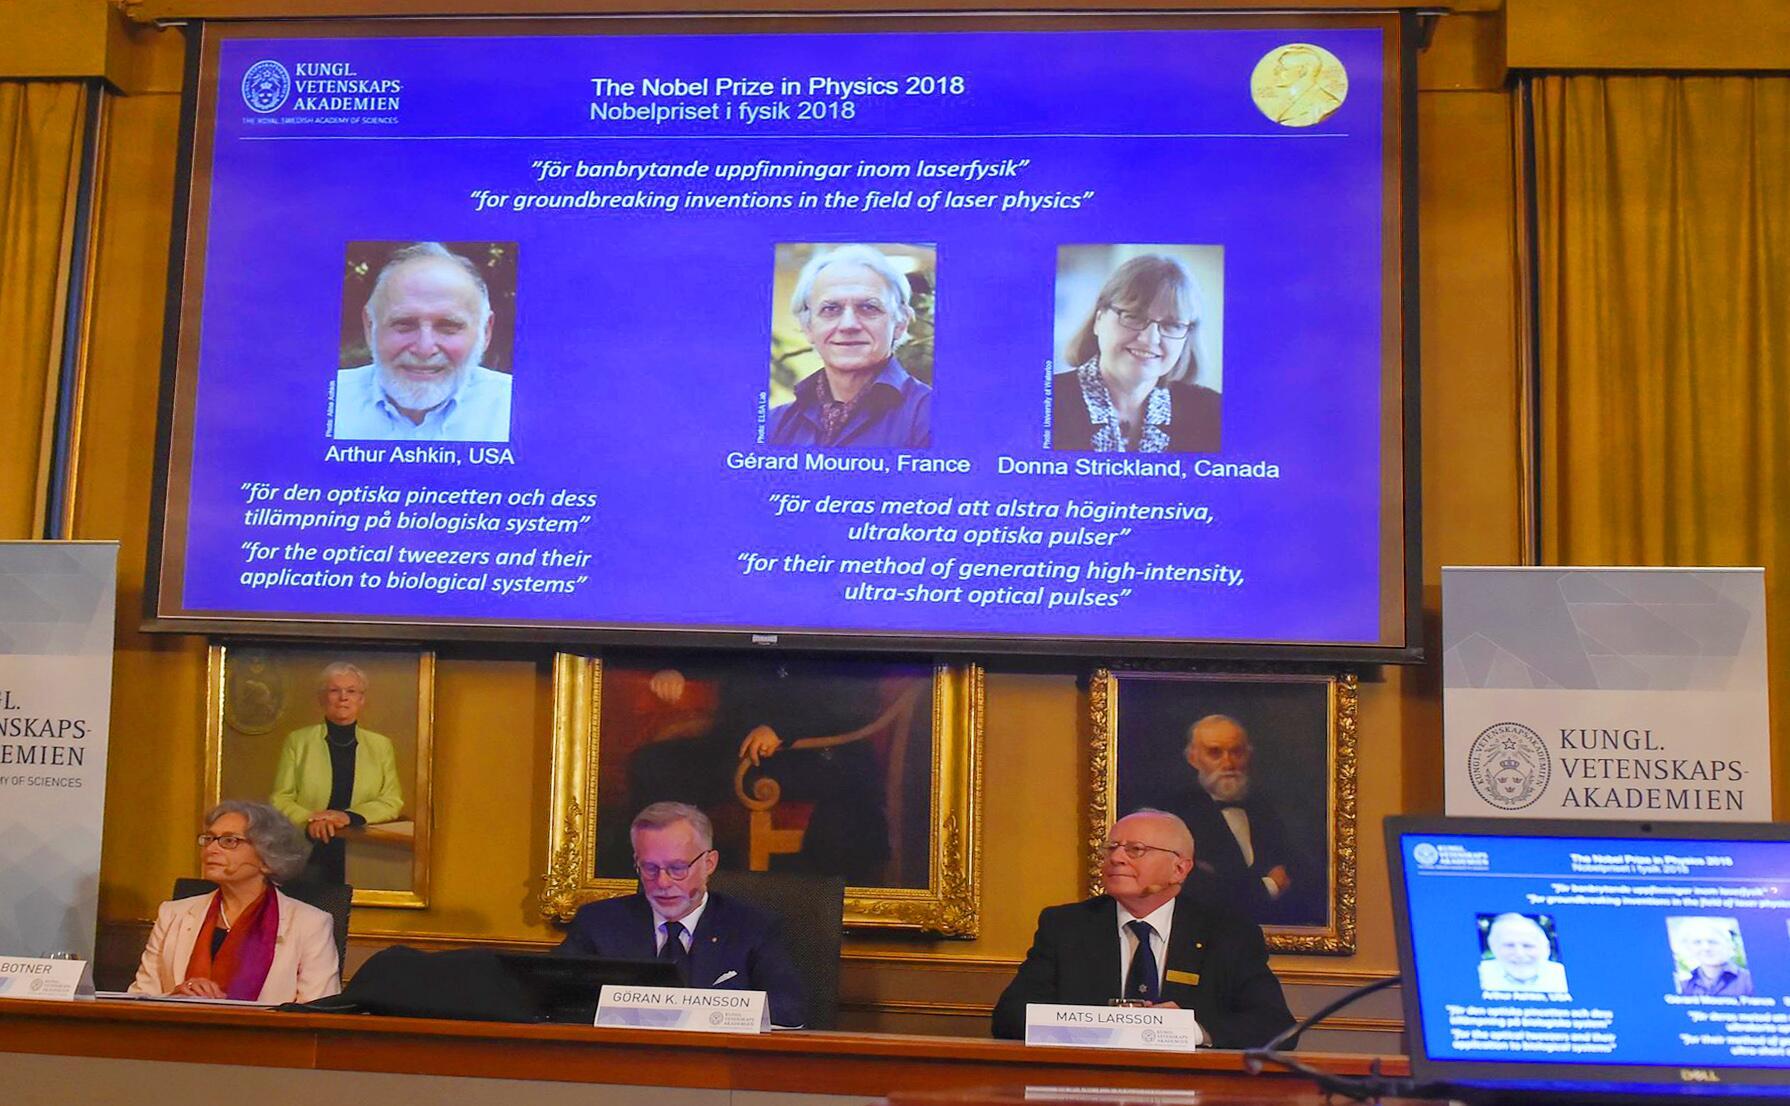 Bild zu Nobelpreis Physik